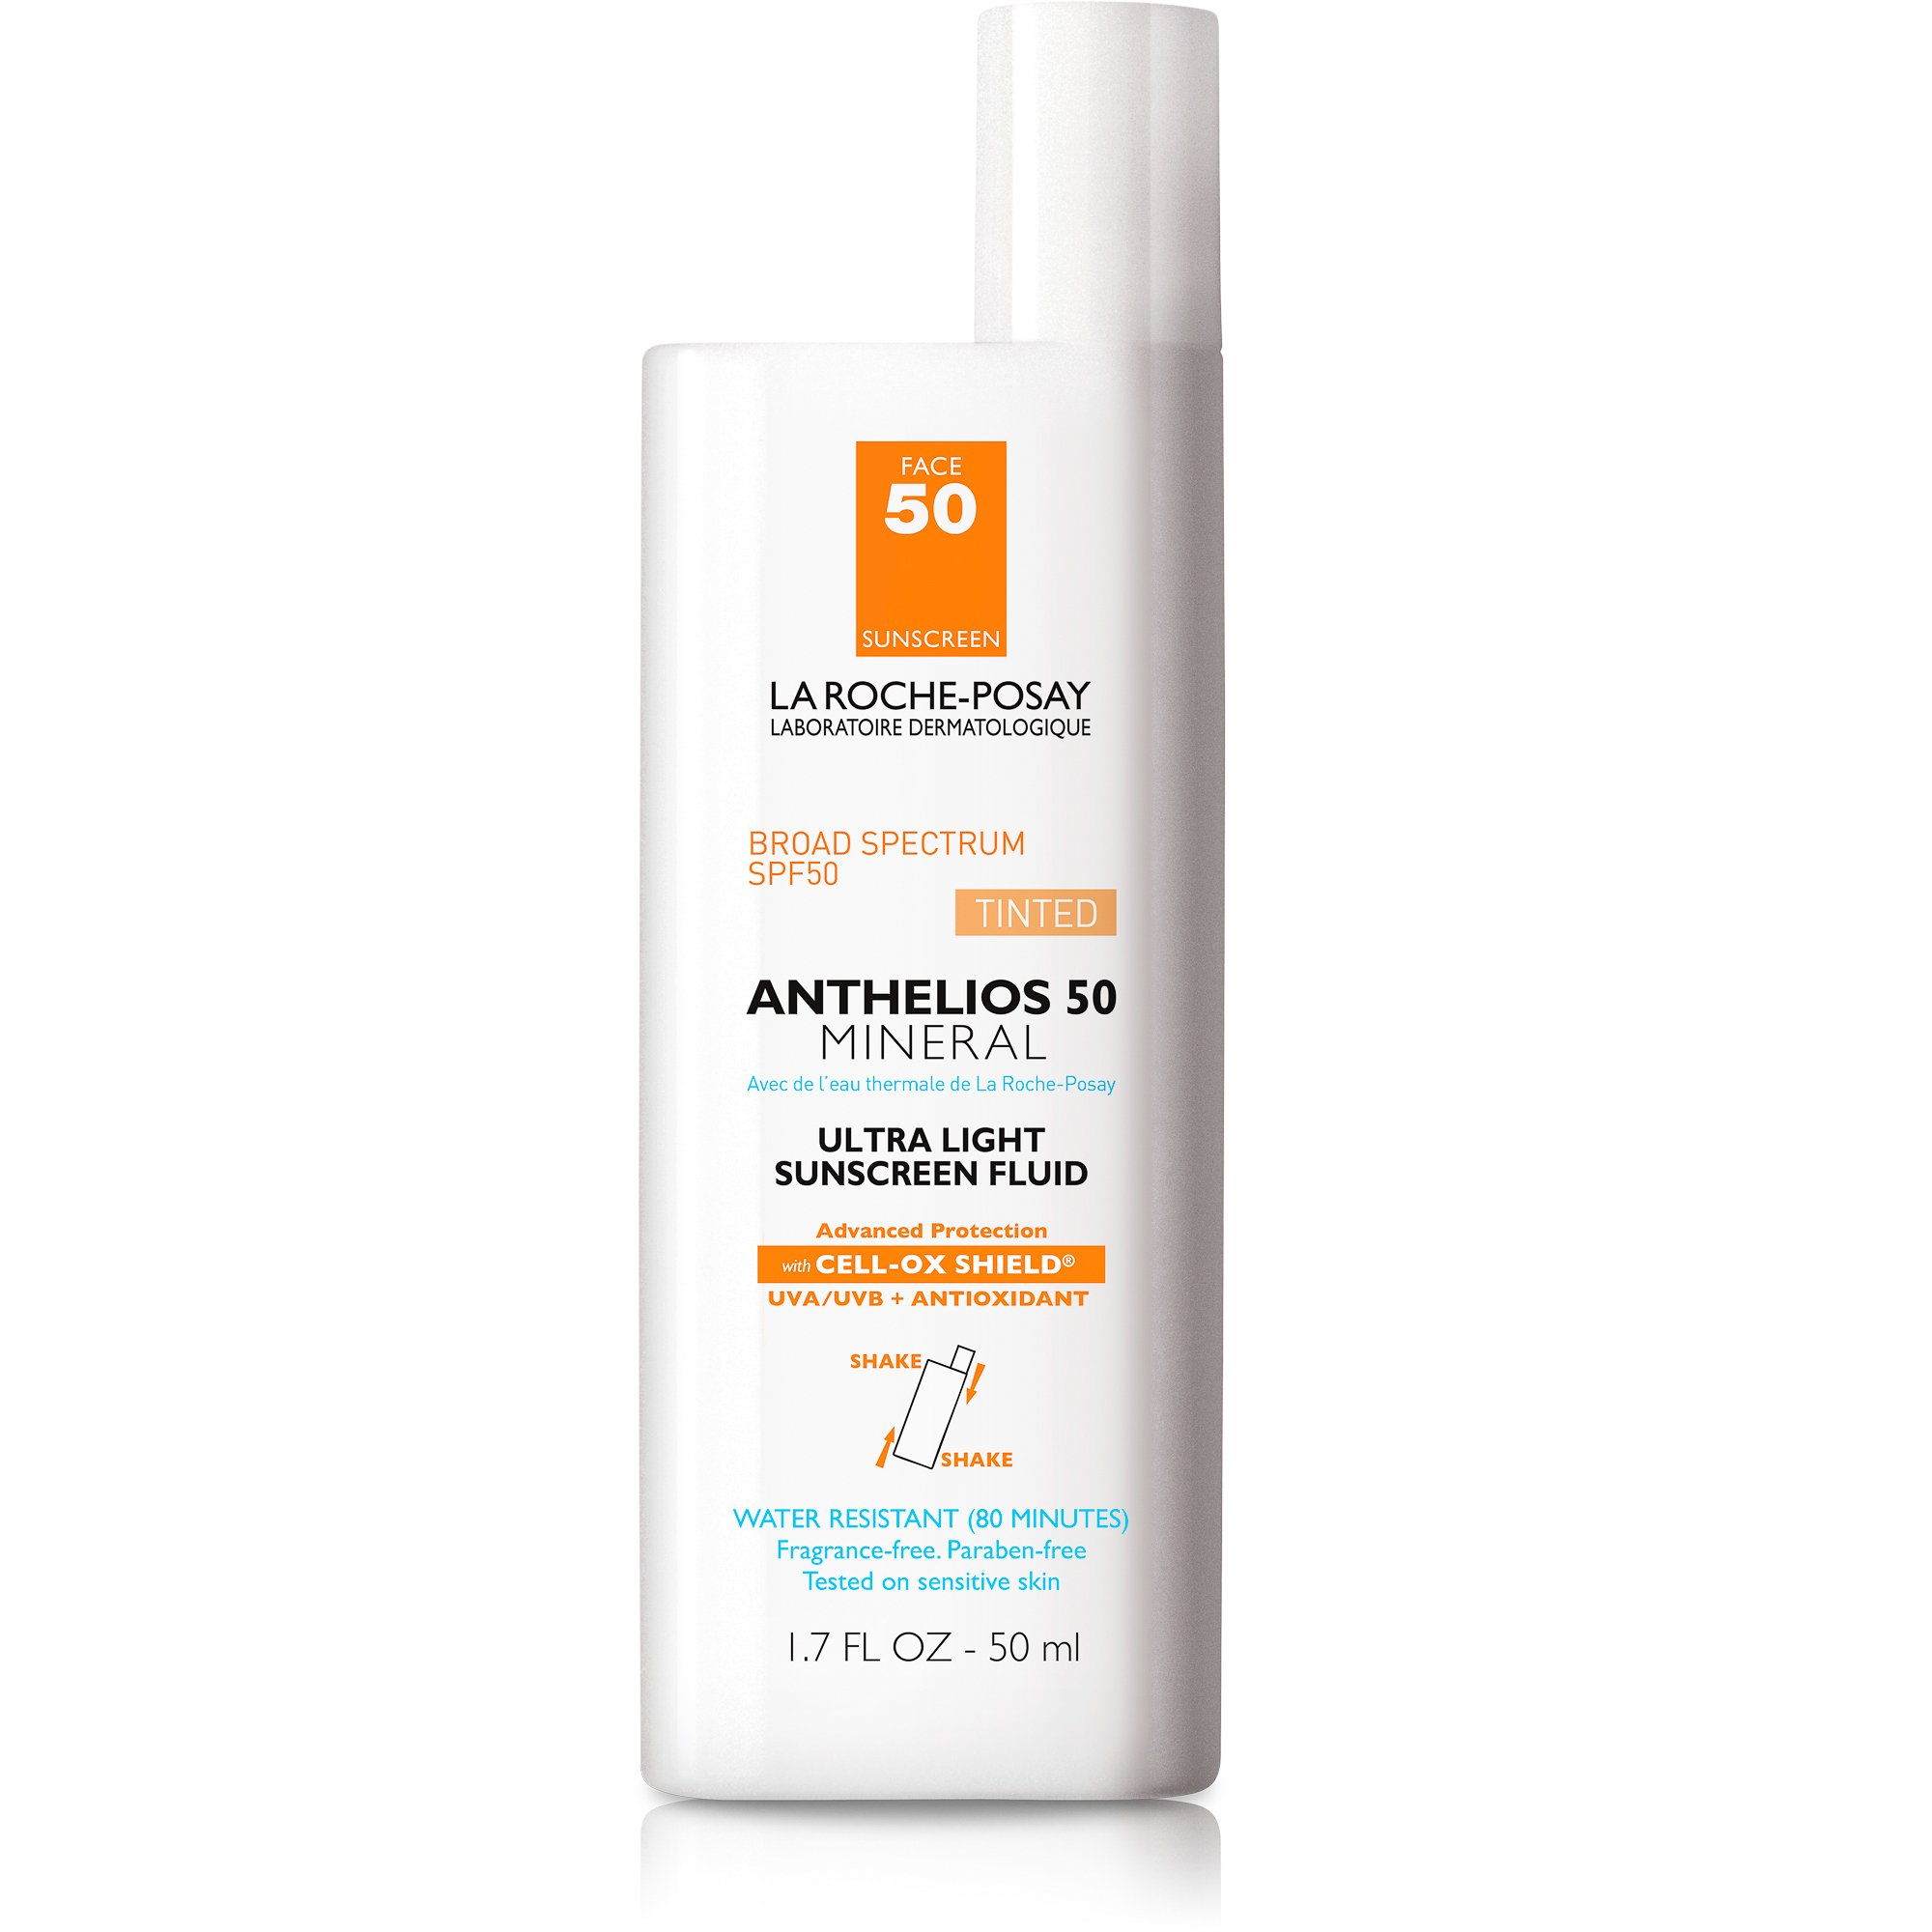 La Roche-Posay Anthelios 50 Mineral Sunscreen SPF 50 Ultra-Light Fluid Face Sunscreen for Sensitive Skin, 1.7 Fl. Oz.